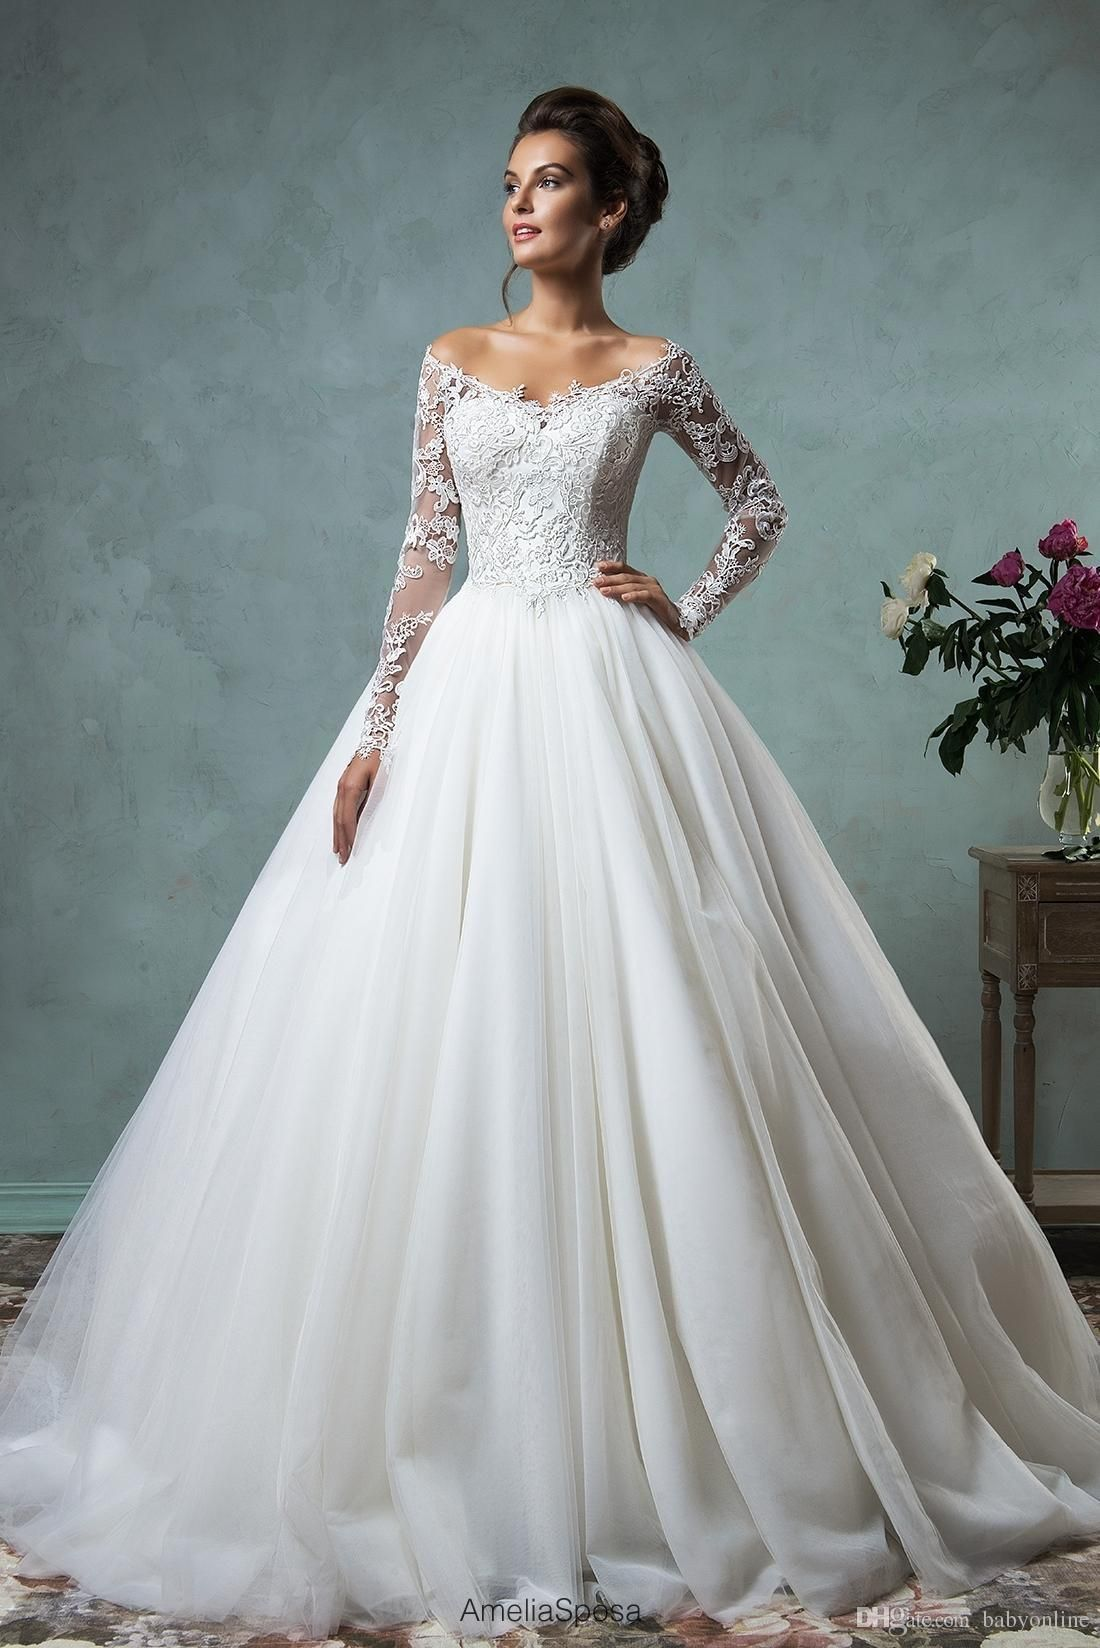 Plus size summer wedding dresses  Amelia Sposa  Spring Summer Lace A Line Wedding Dresses Plus